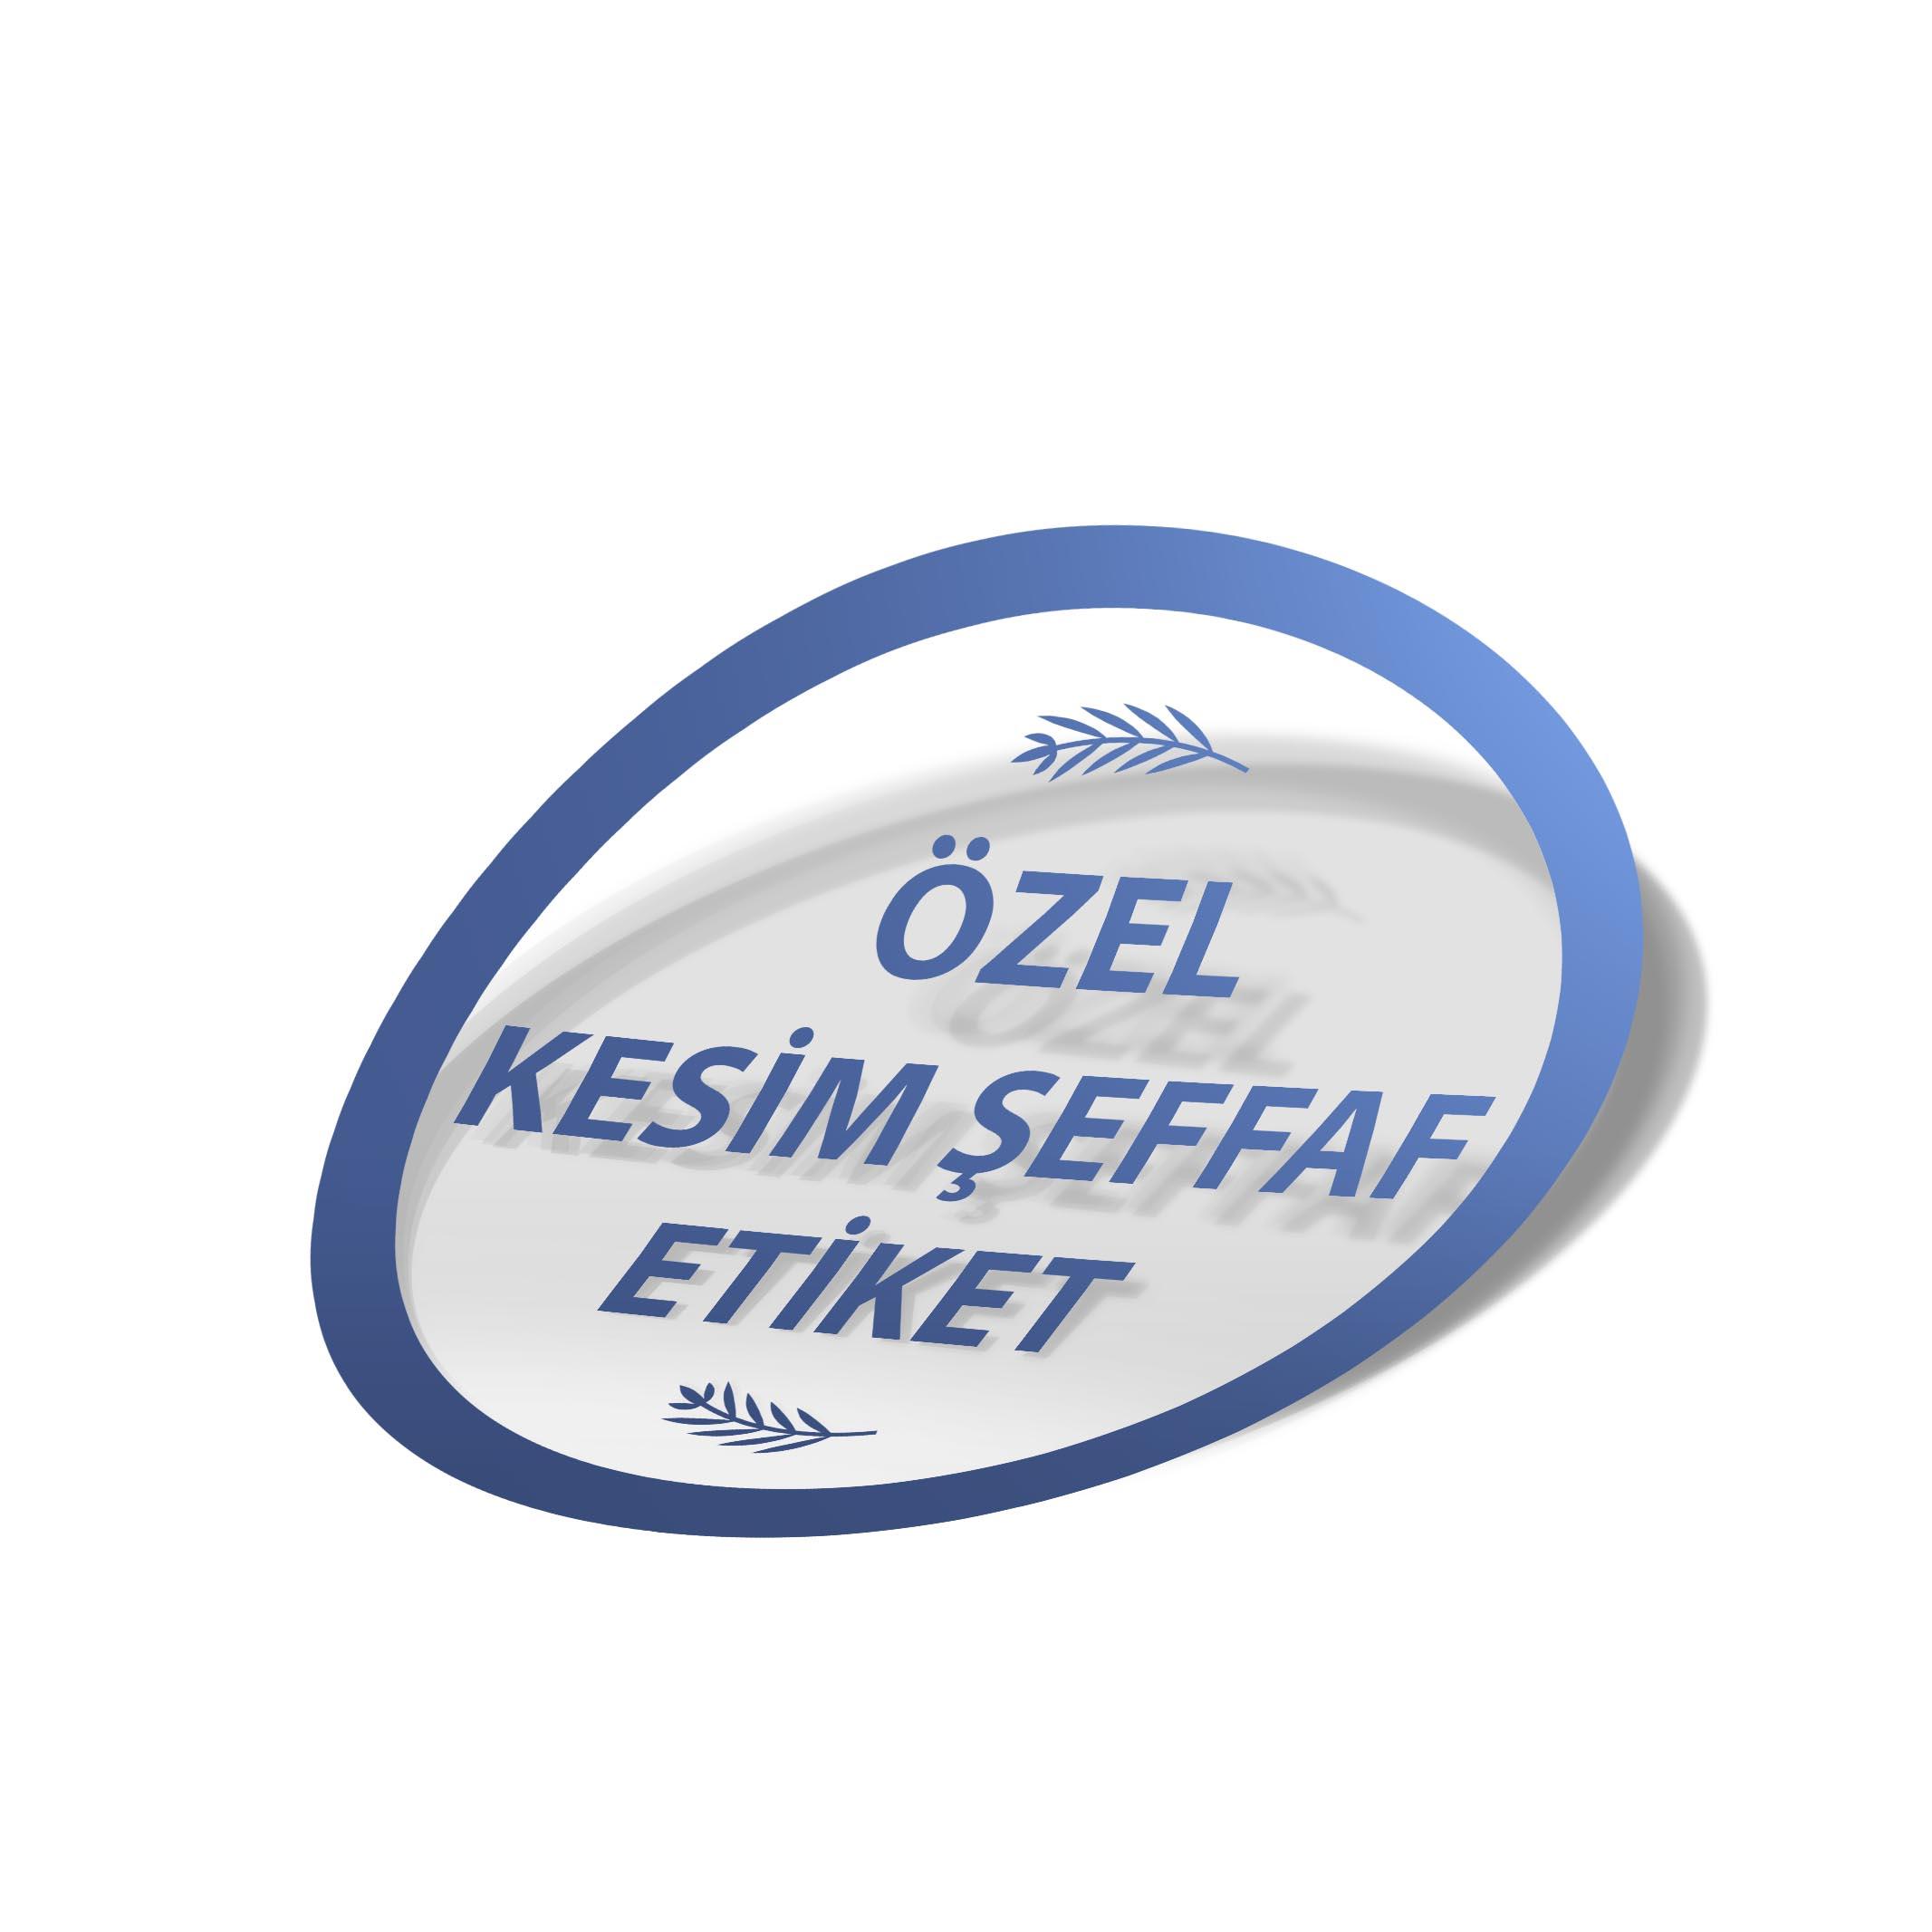 Şeffaf Etiket